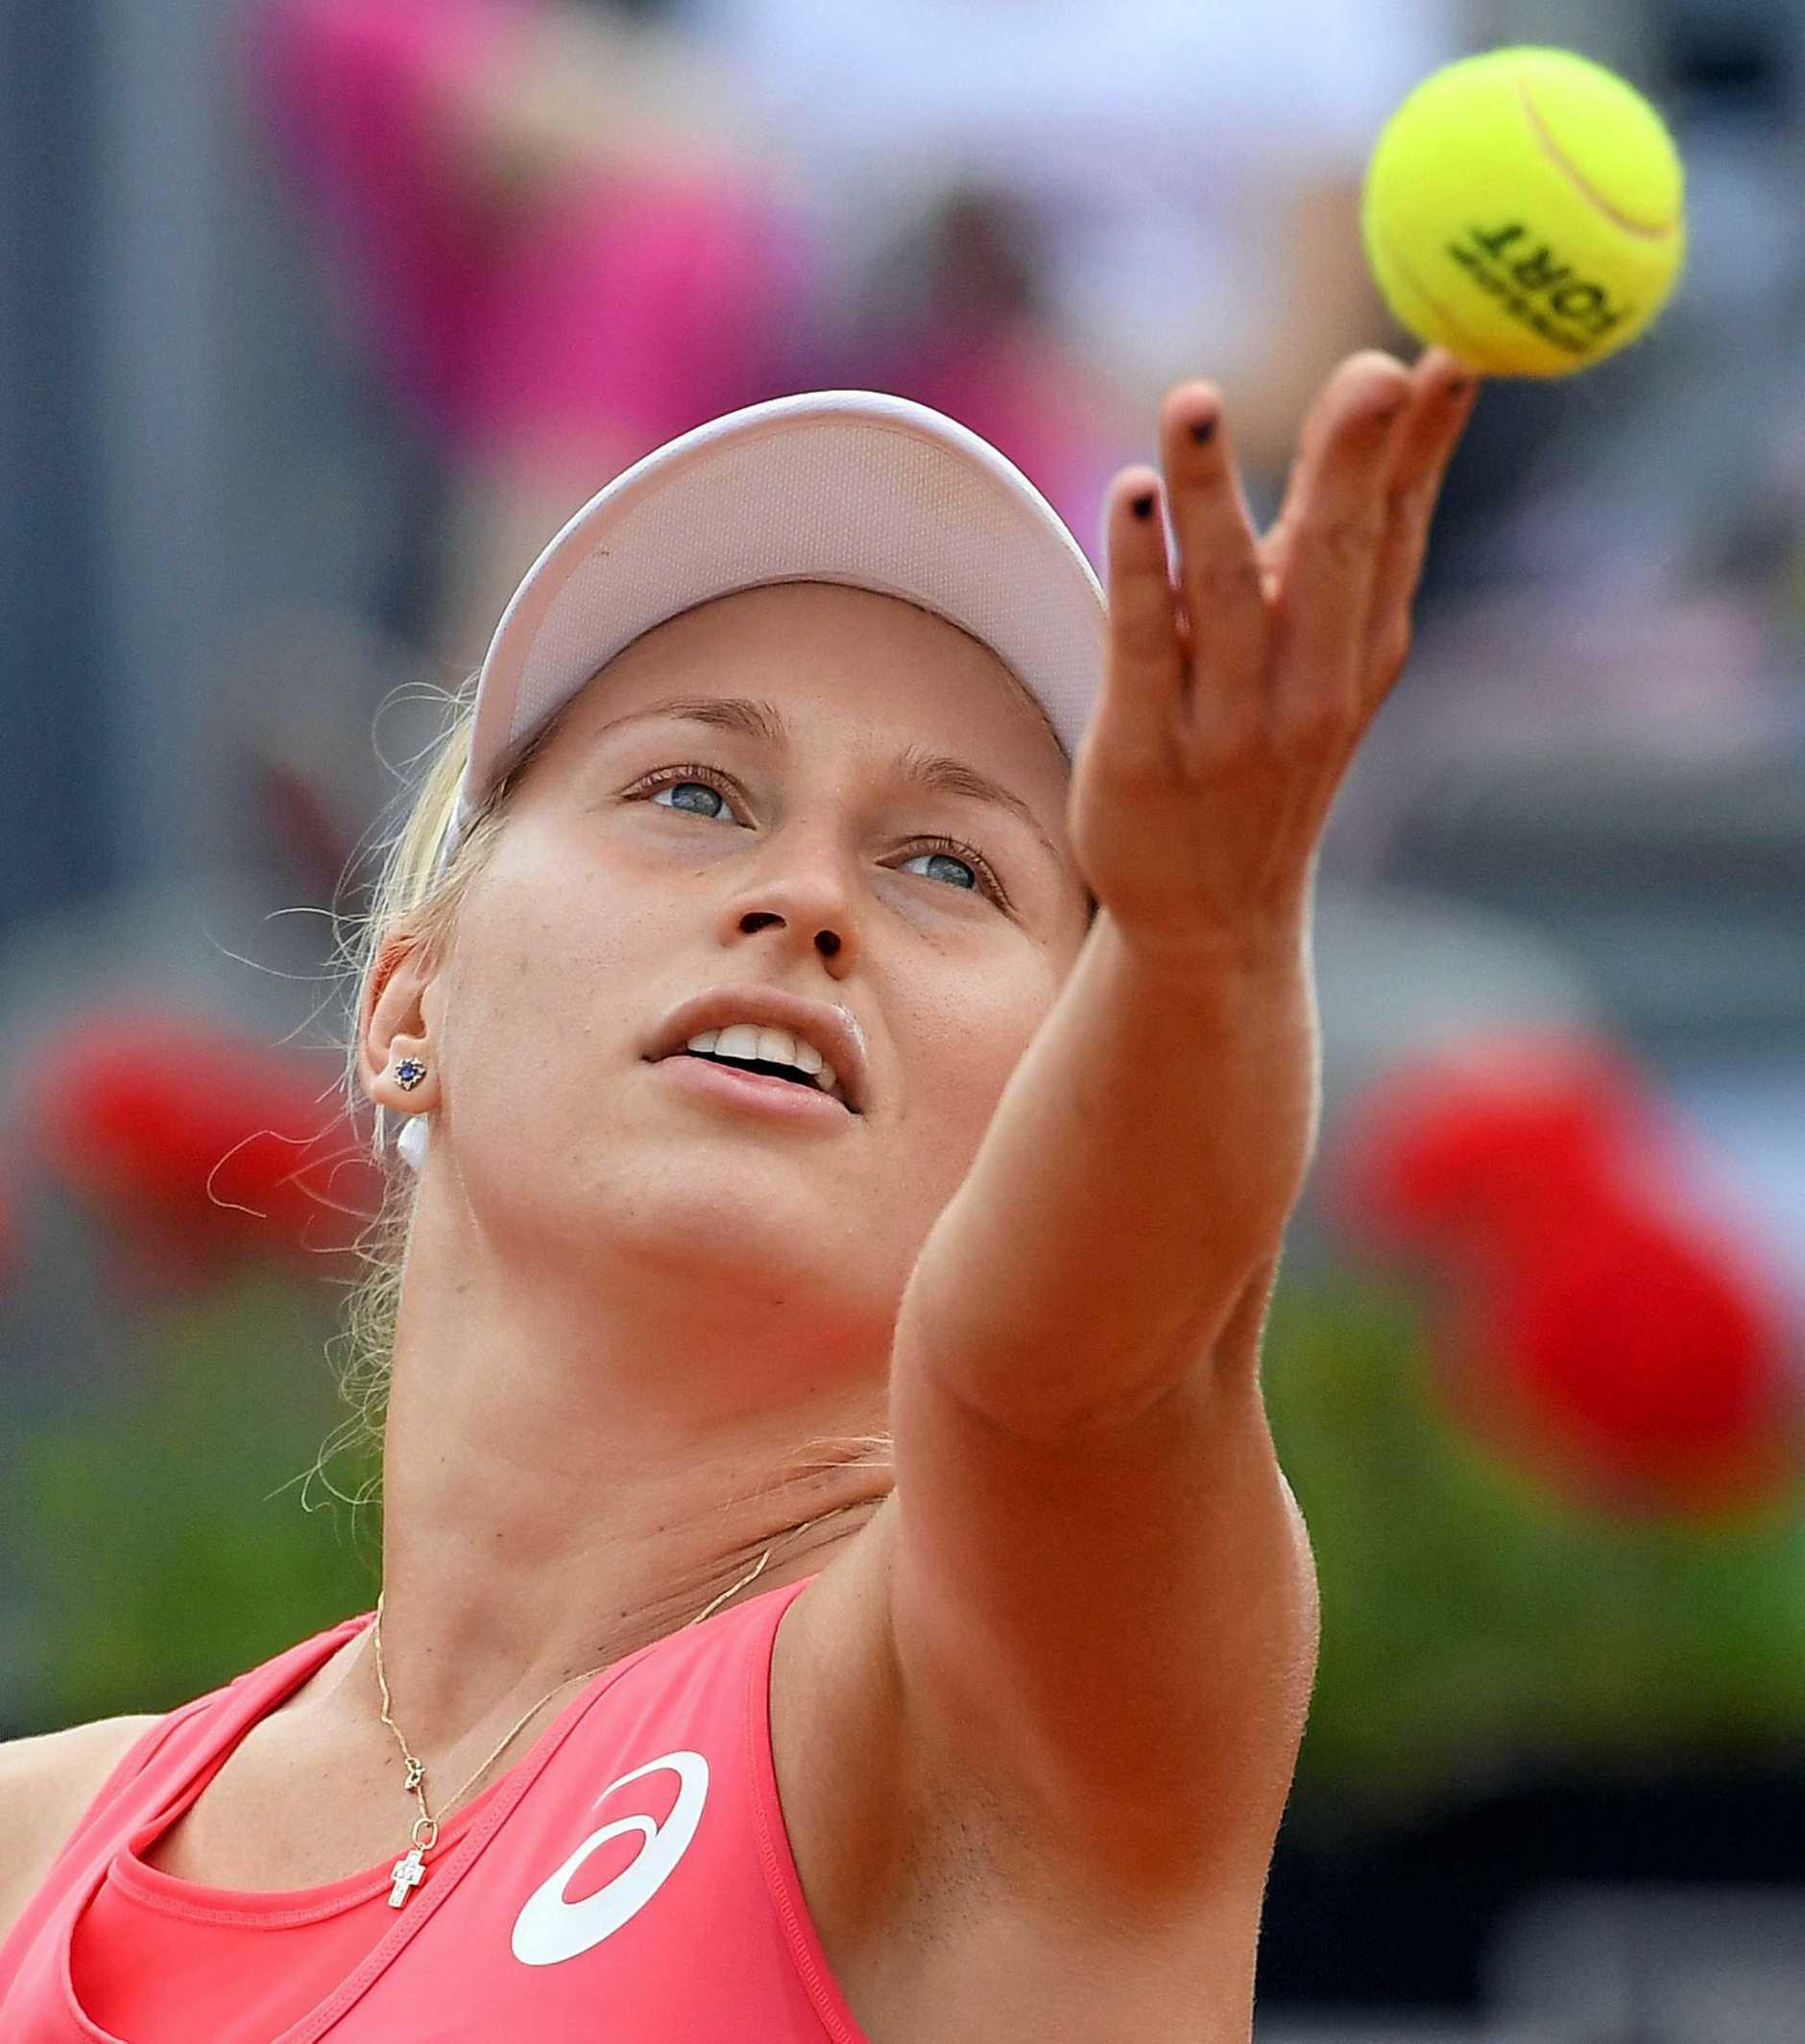 Australian tennis player Daria Gavrilova.